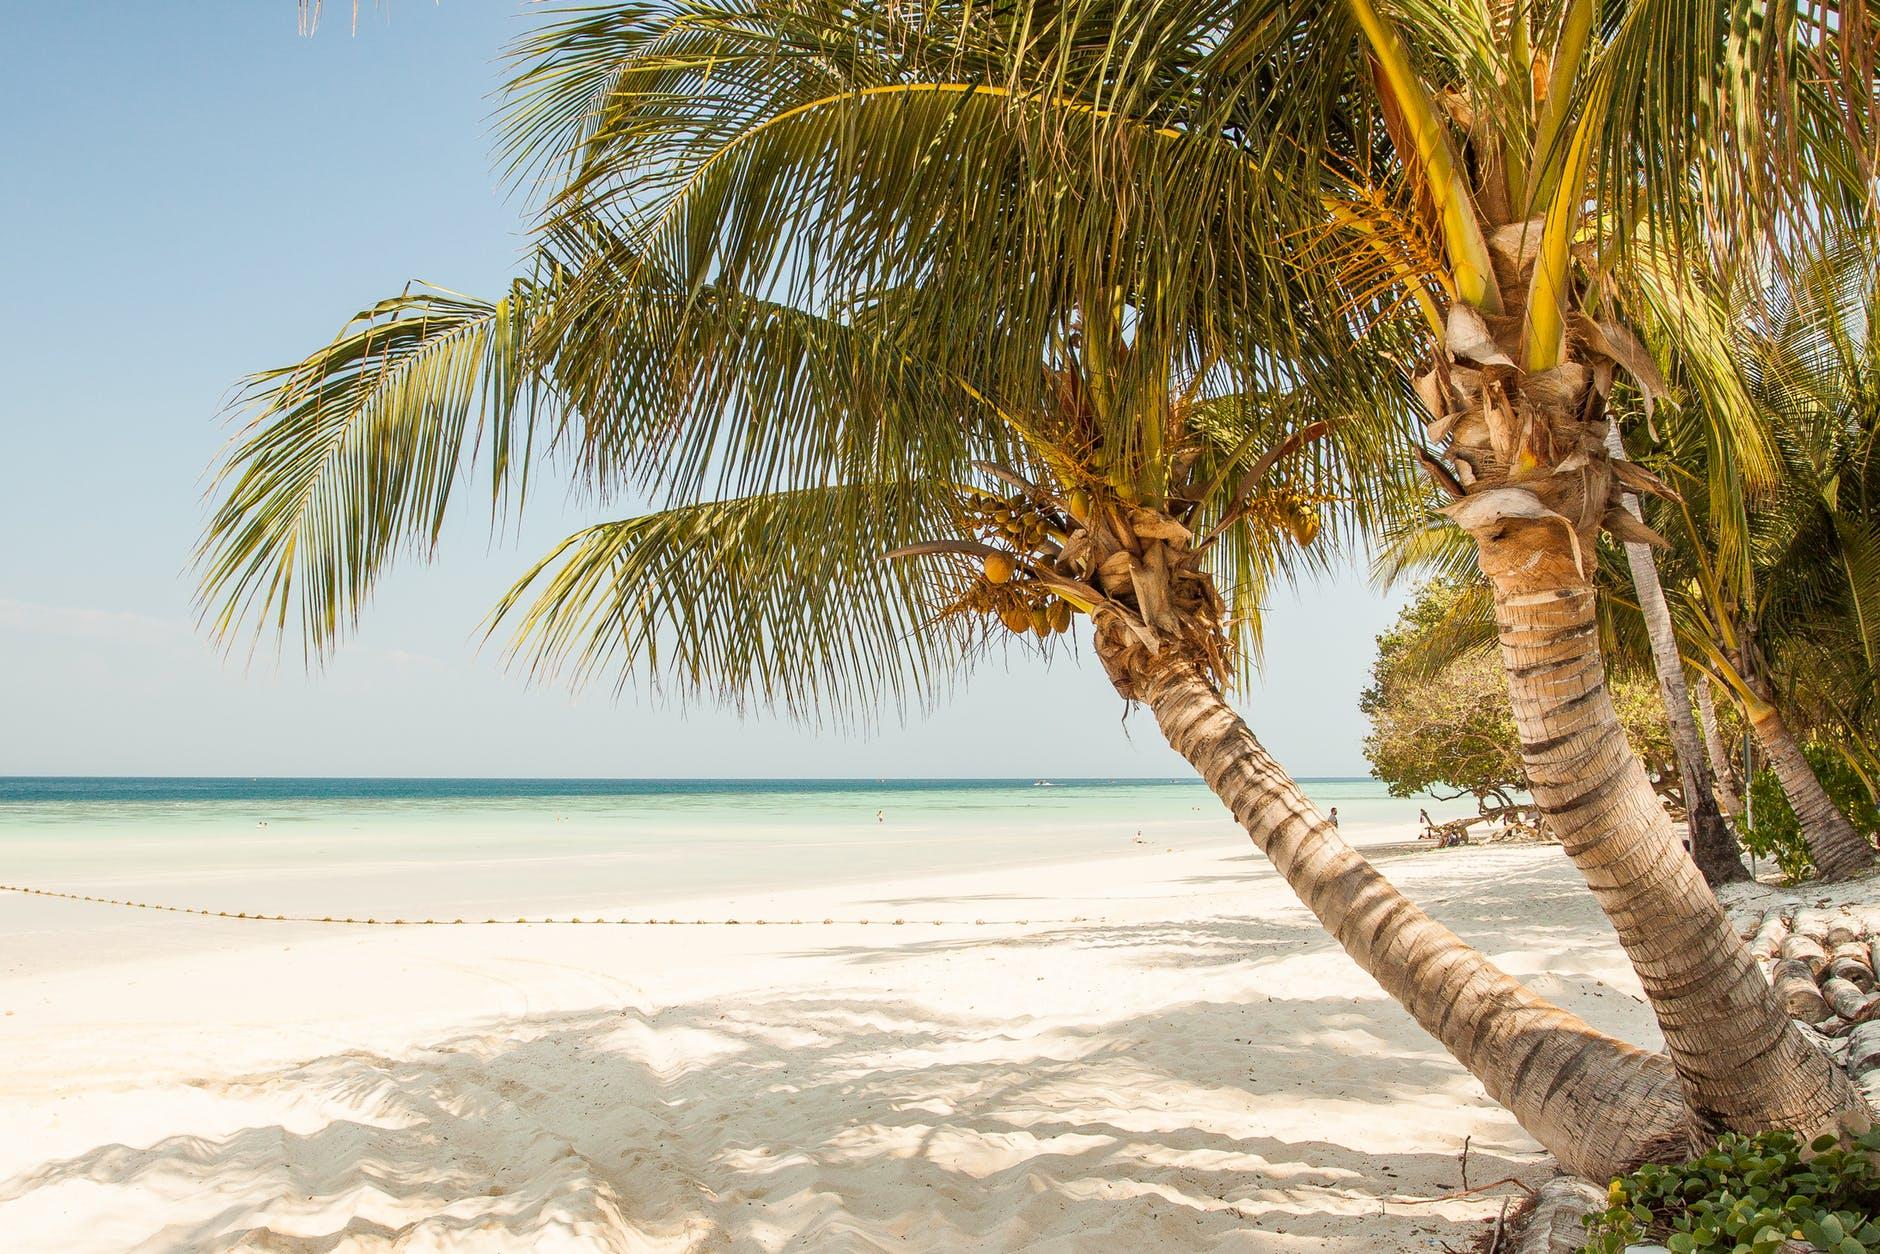 beach coast coastline coconut trees